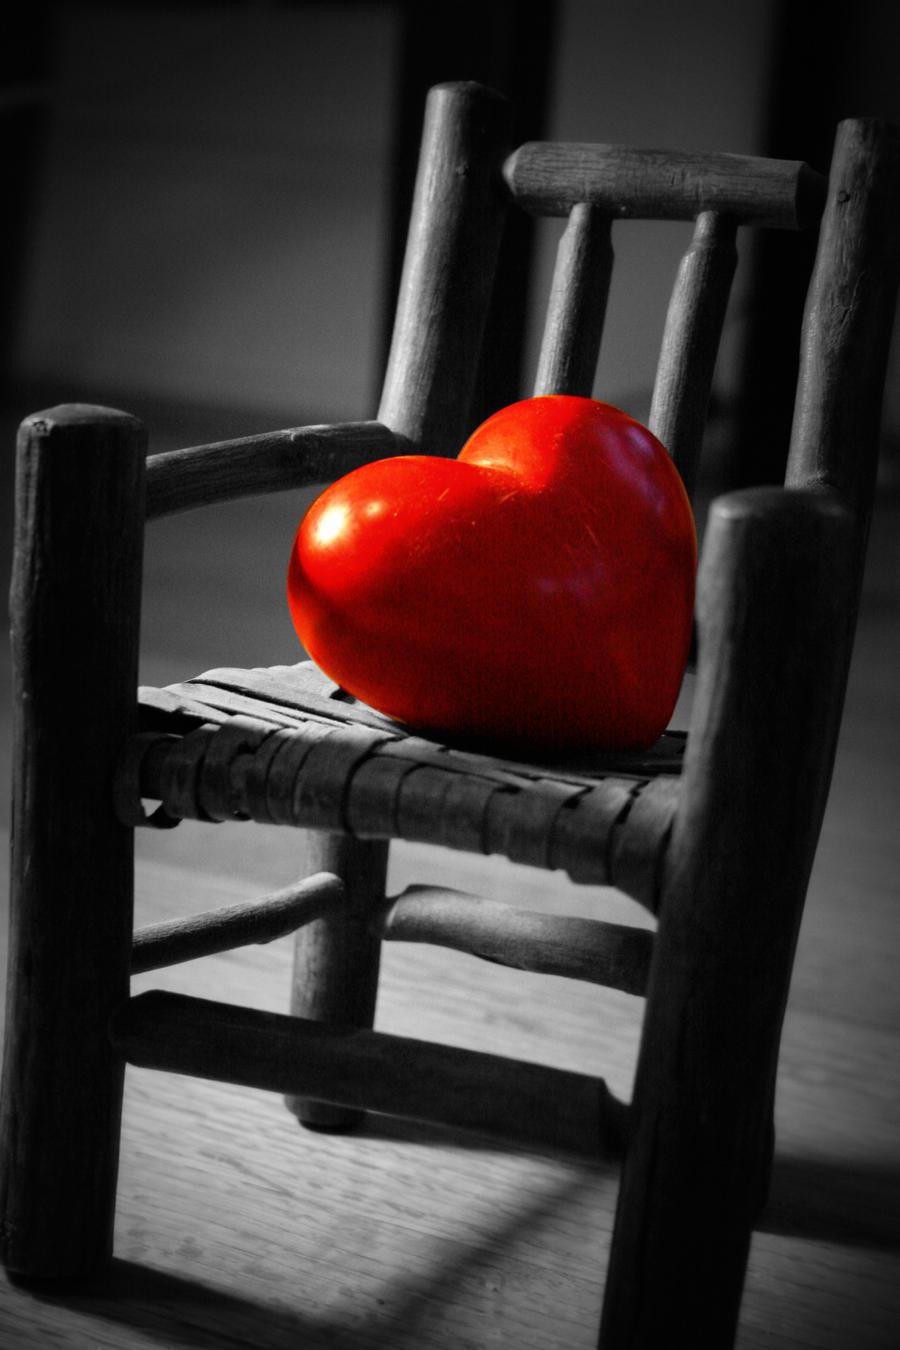 Razbijemo monotoniju bojom Waiting_For_Love___by_LoveOfTheFallen